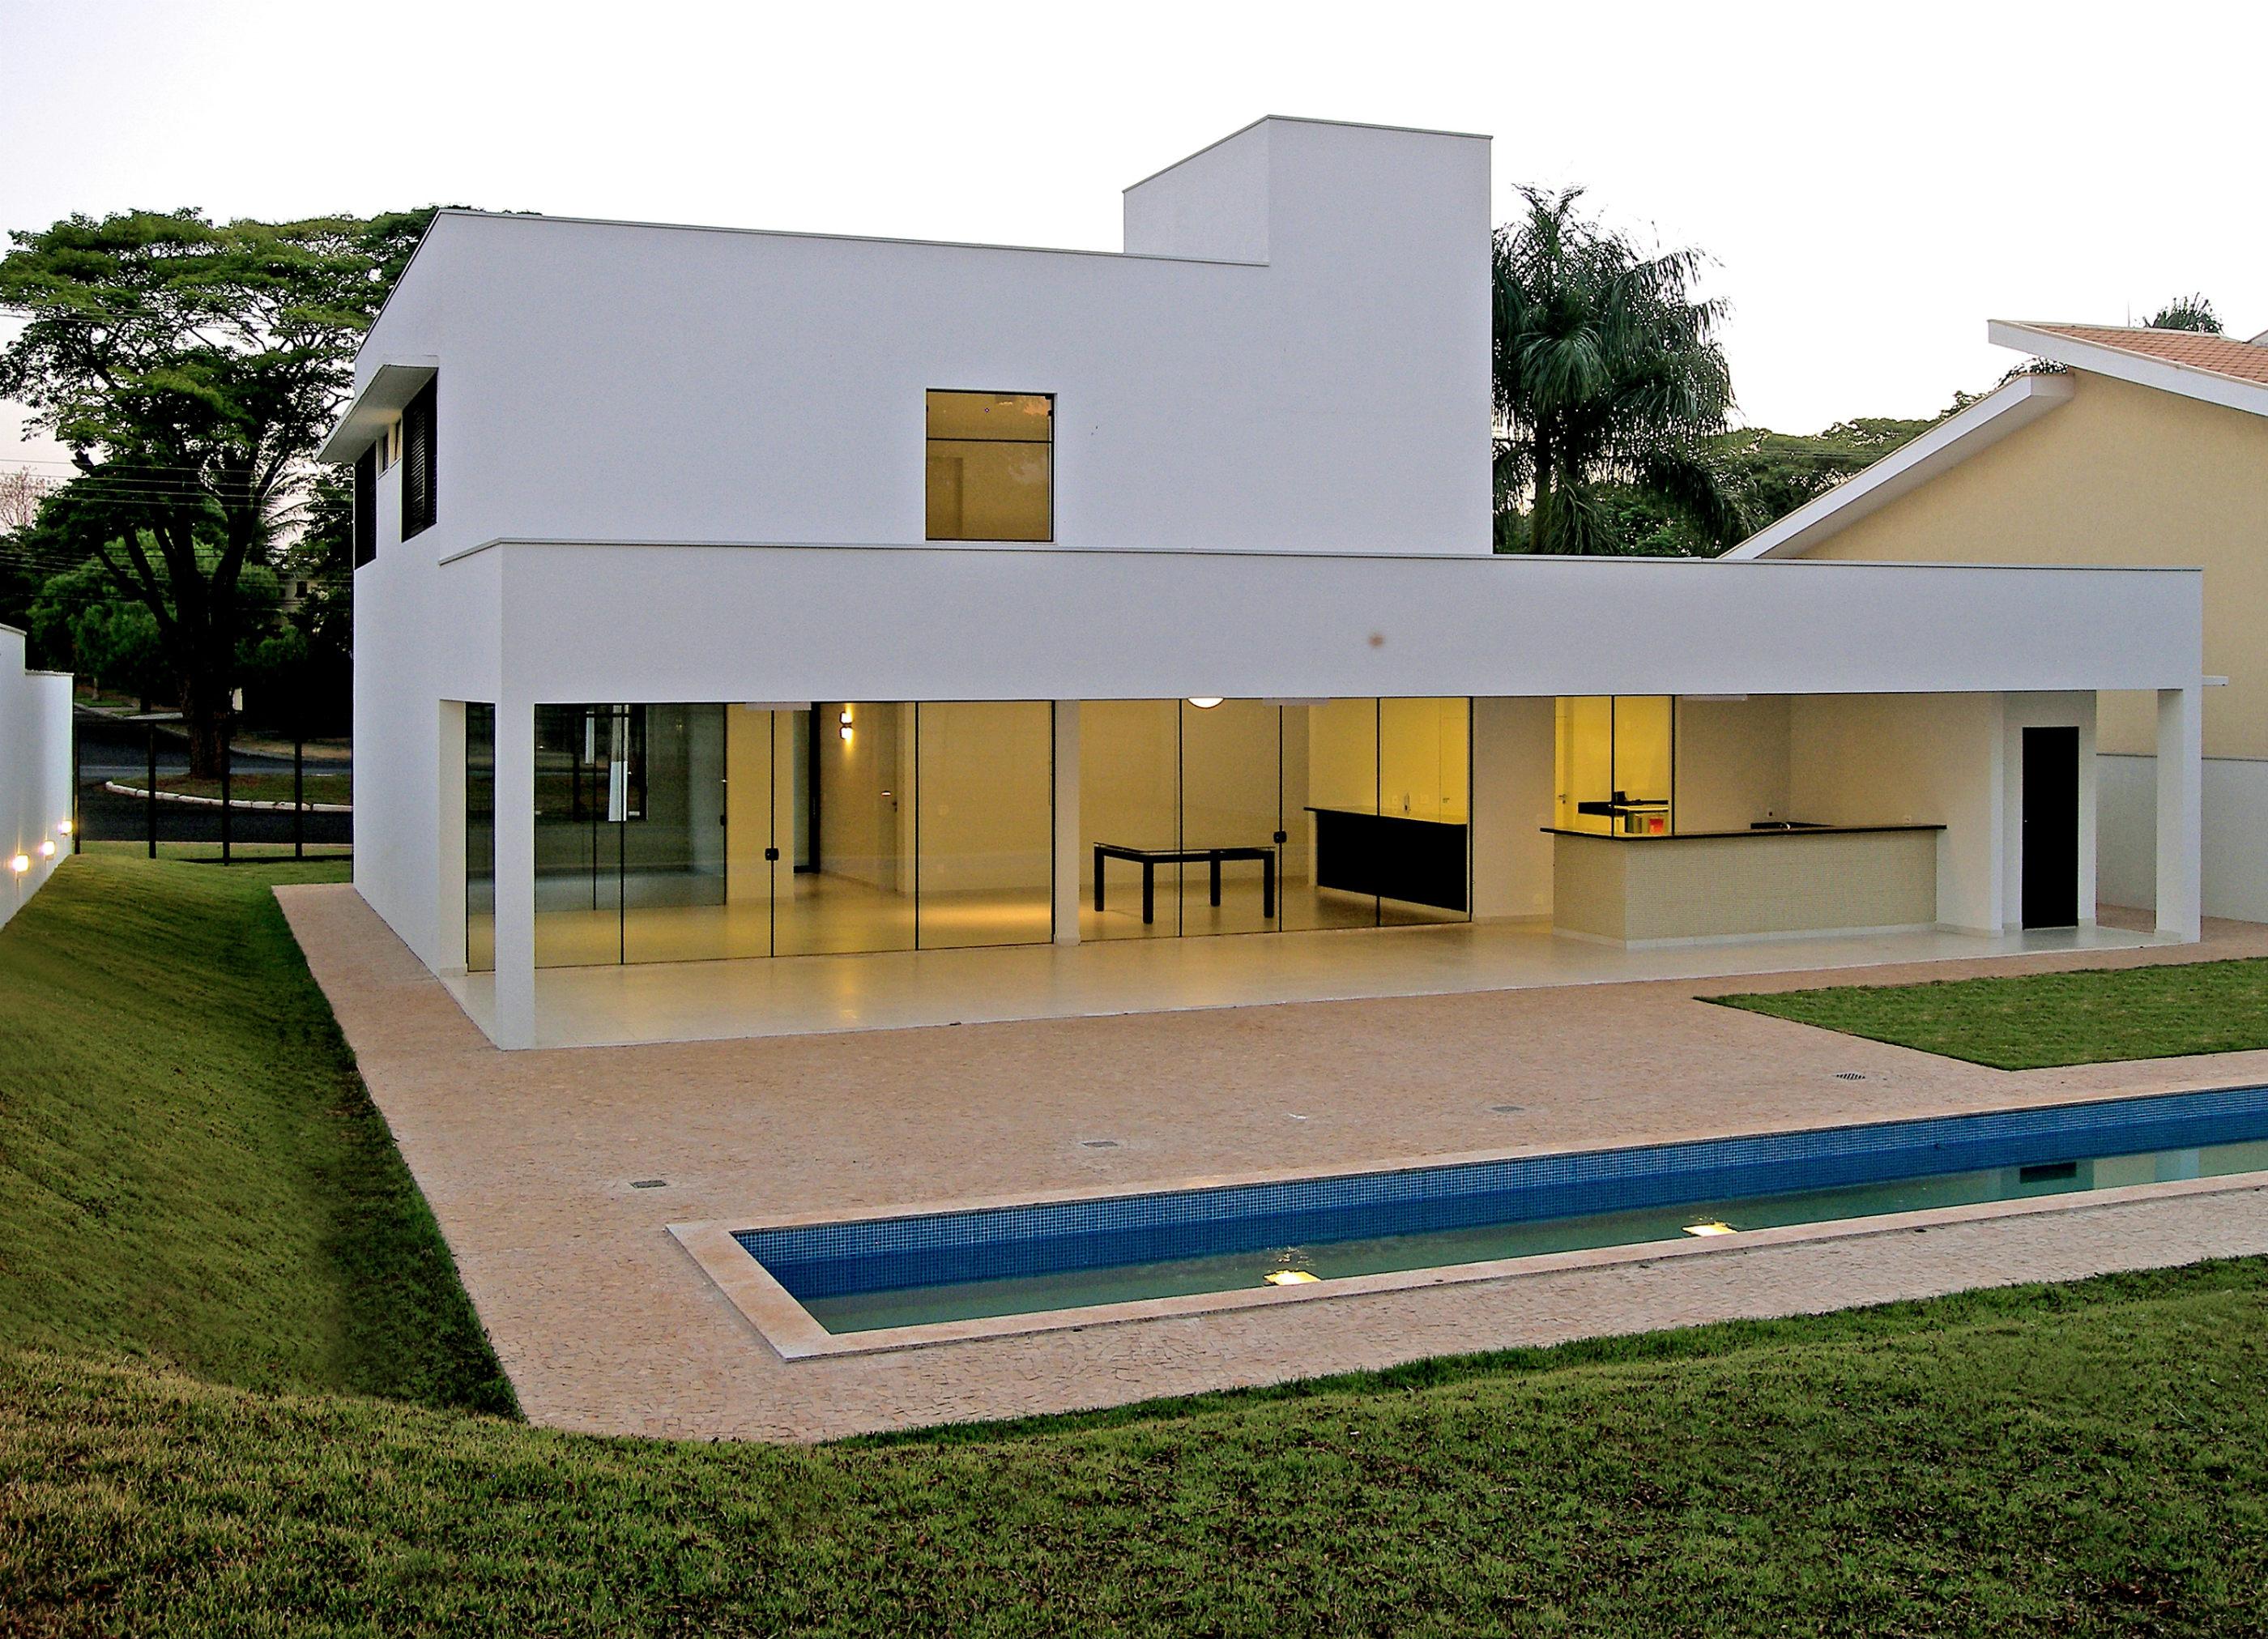 joel_pereira_arquitetura_residencia_minimalista_arquiteto_riberiao_preto_volume_arquitetonico 3